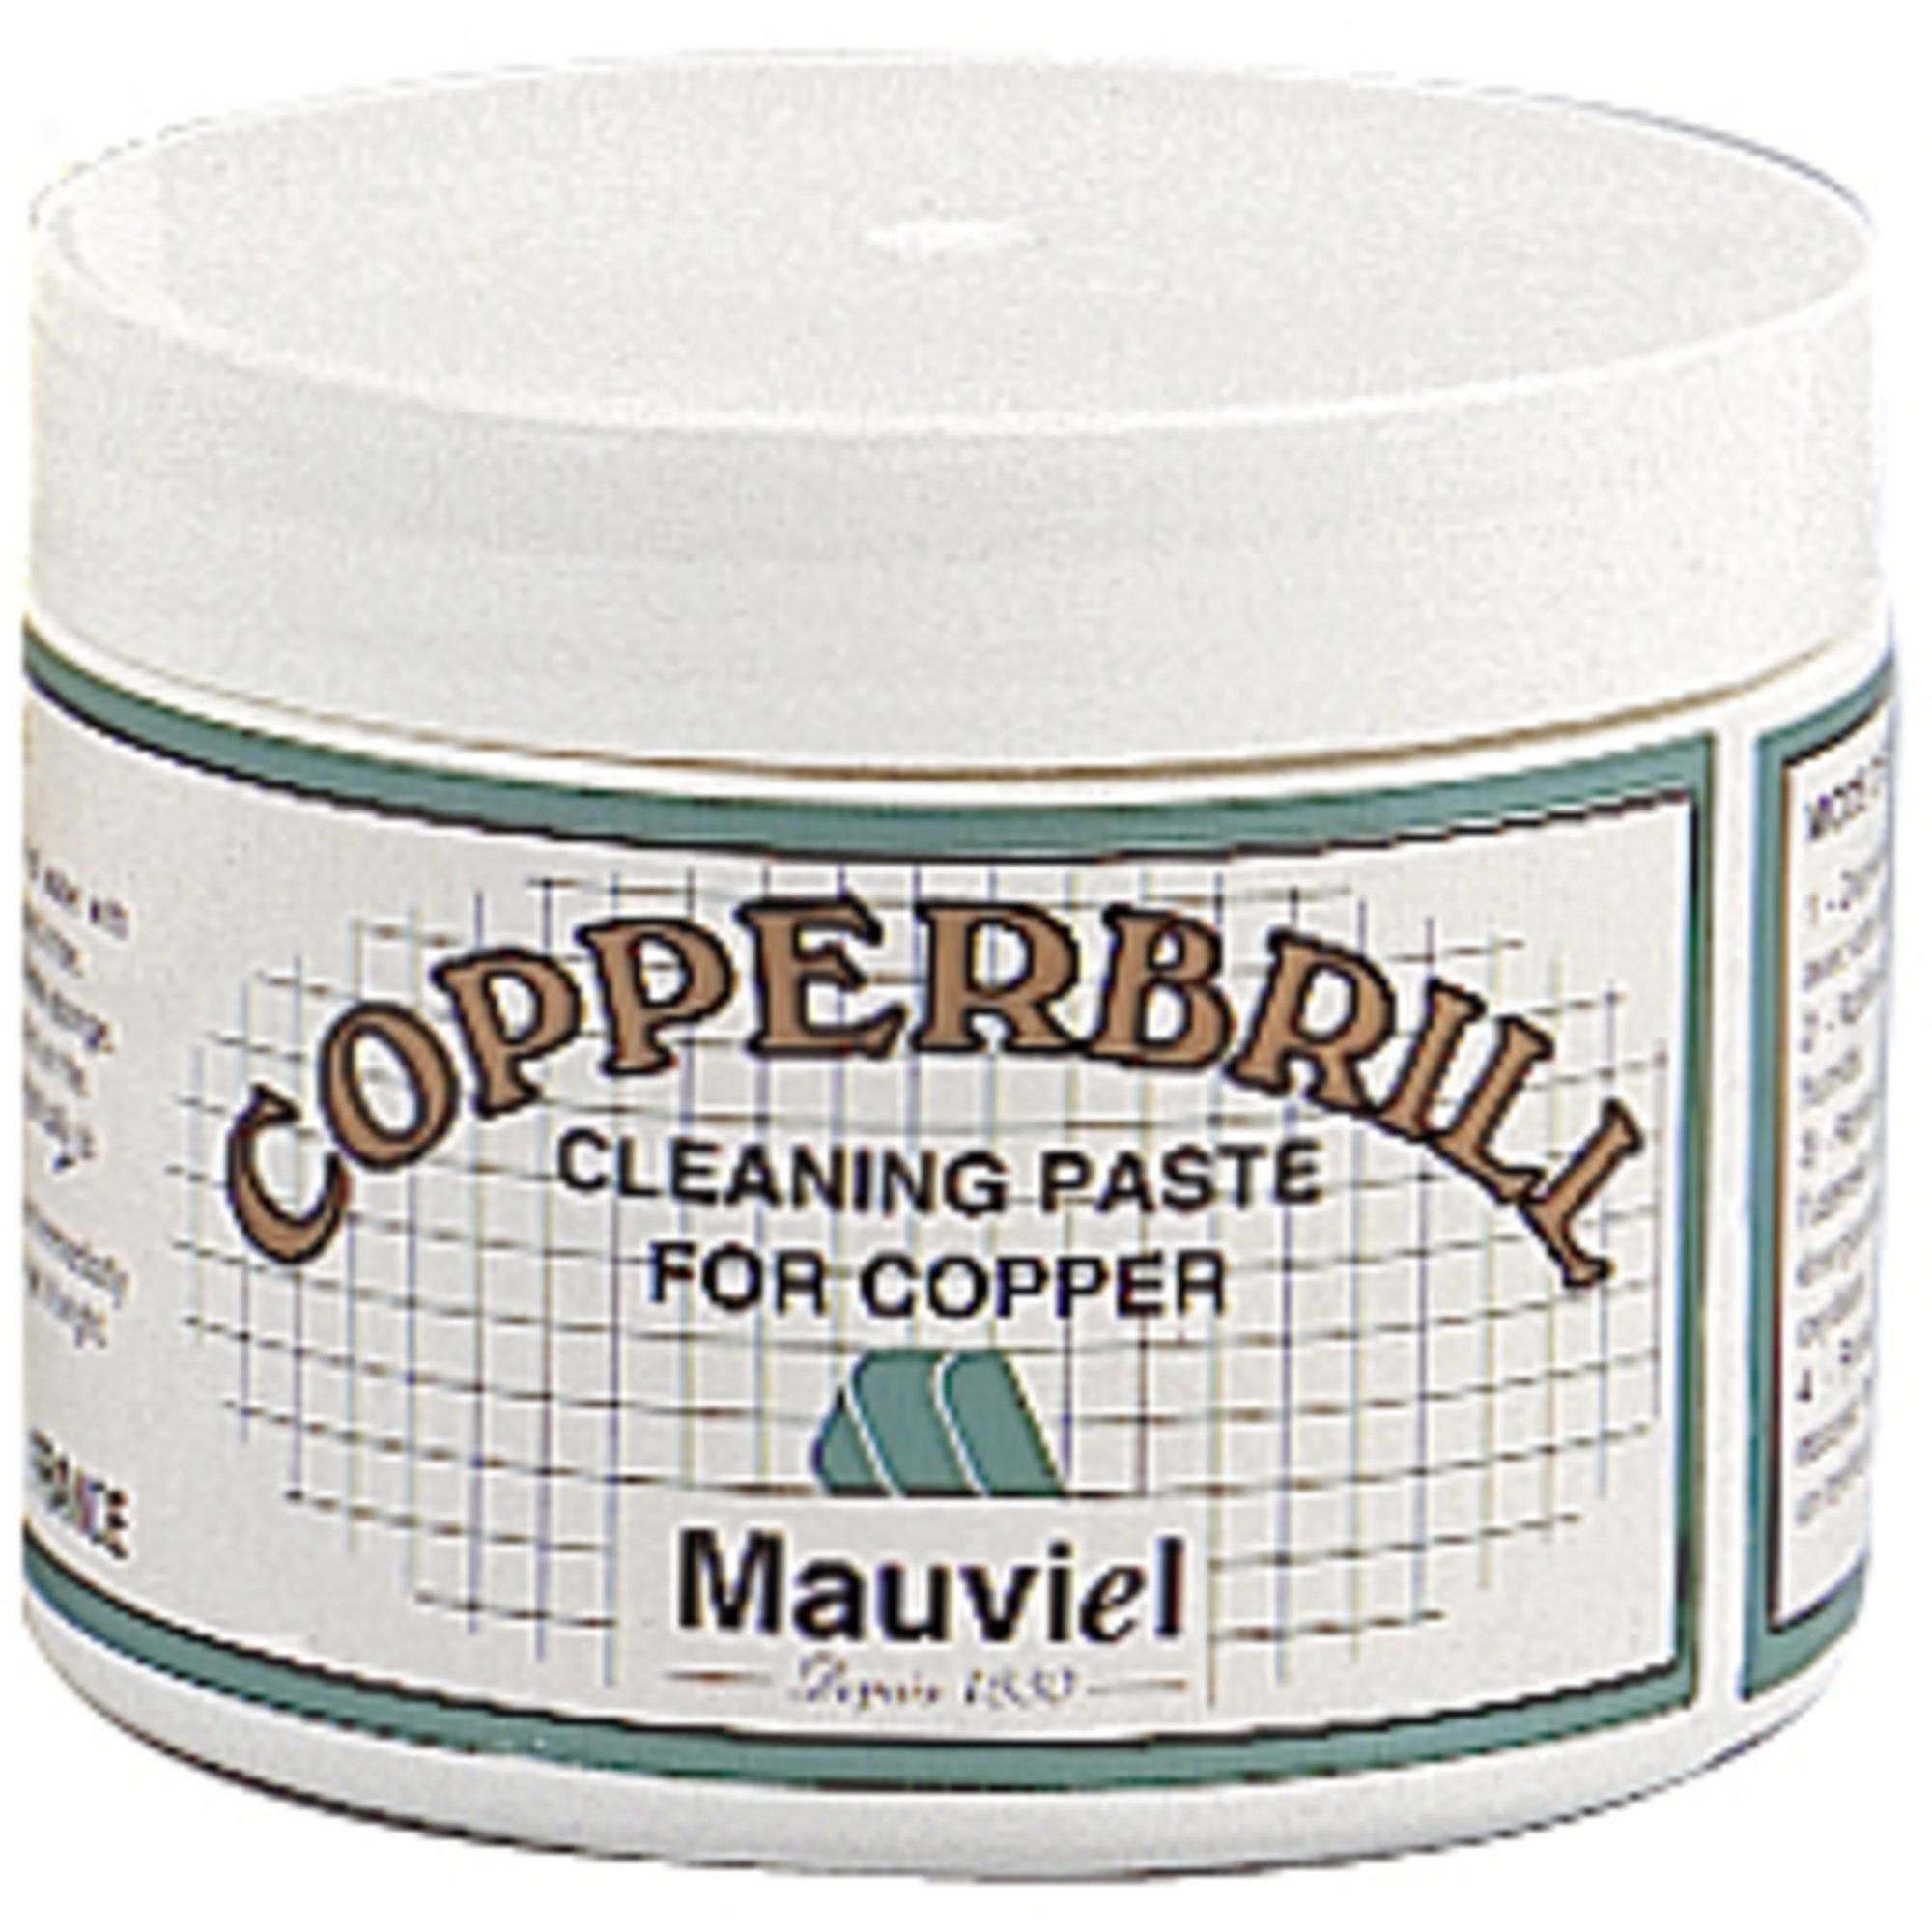 Mauviel Kopparputsmedel 15 cl